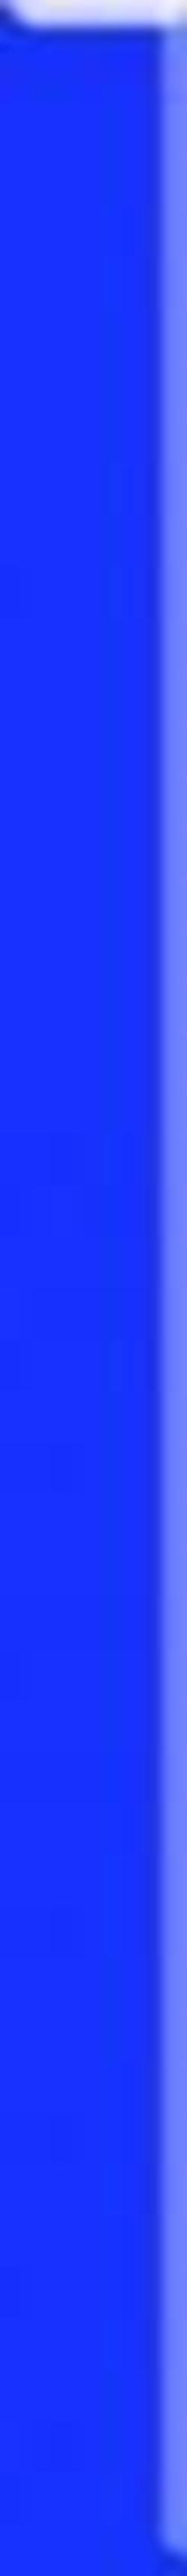 Paradyż Uniwersalna Listwa Szklana Cobalt